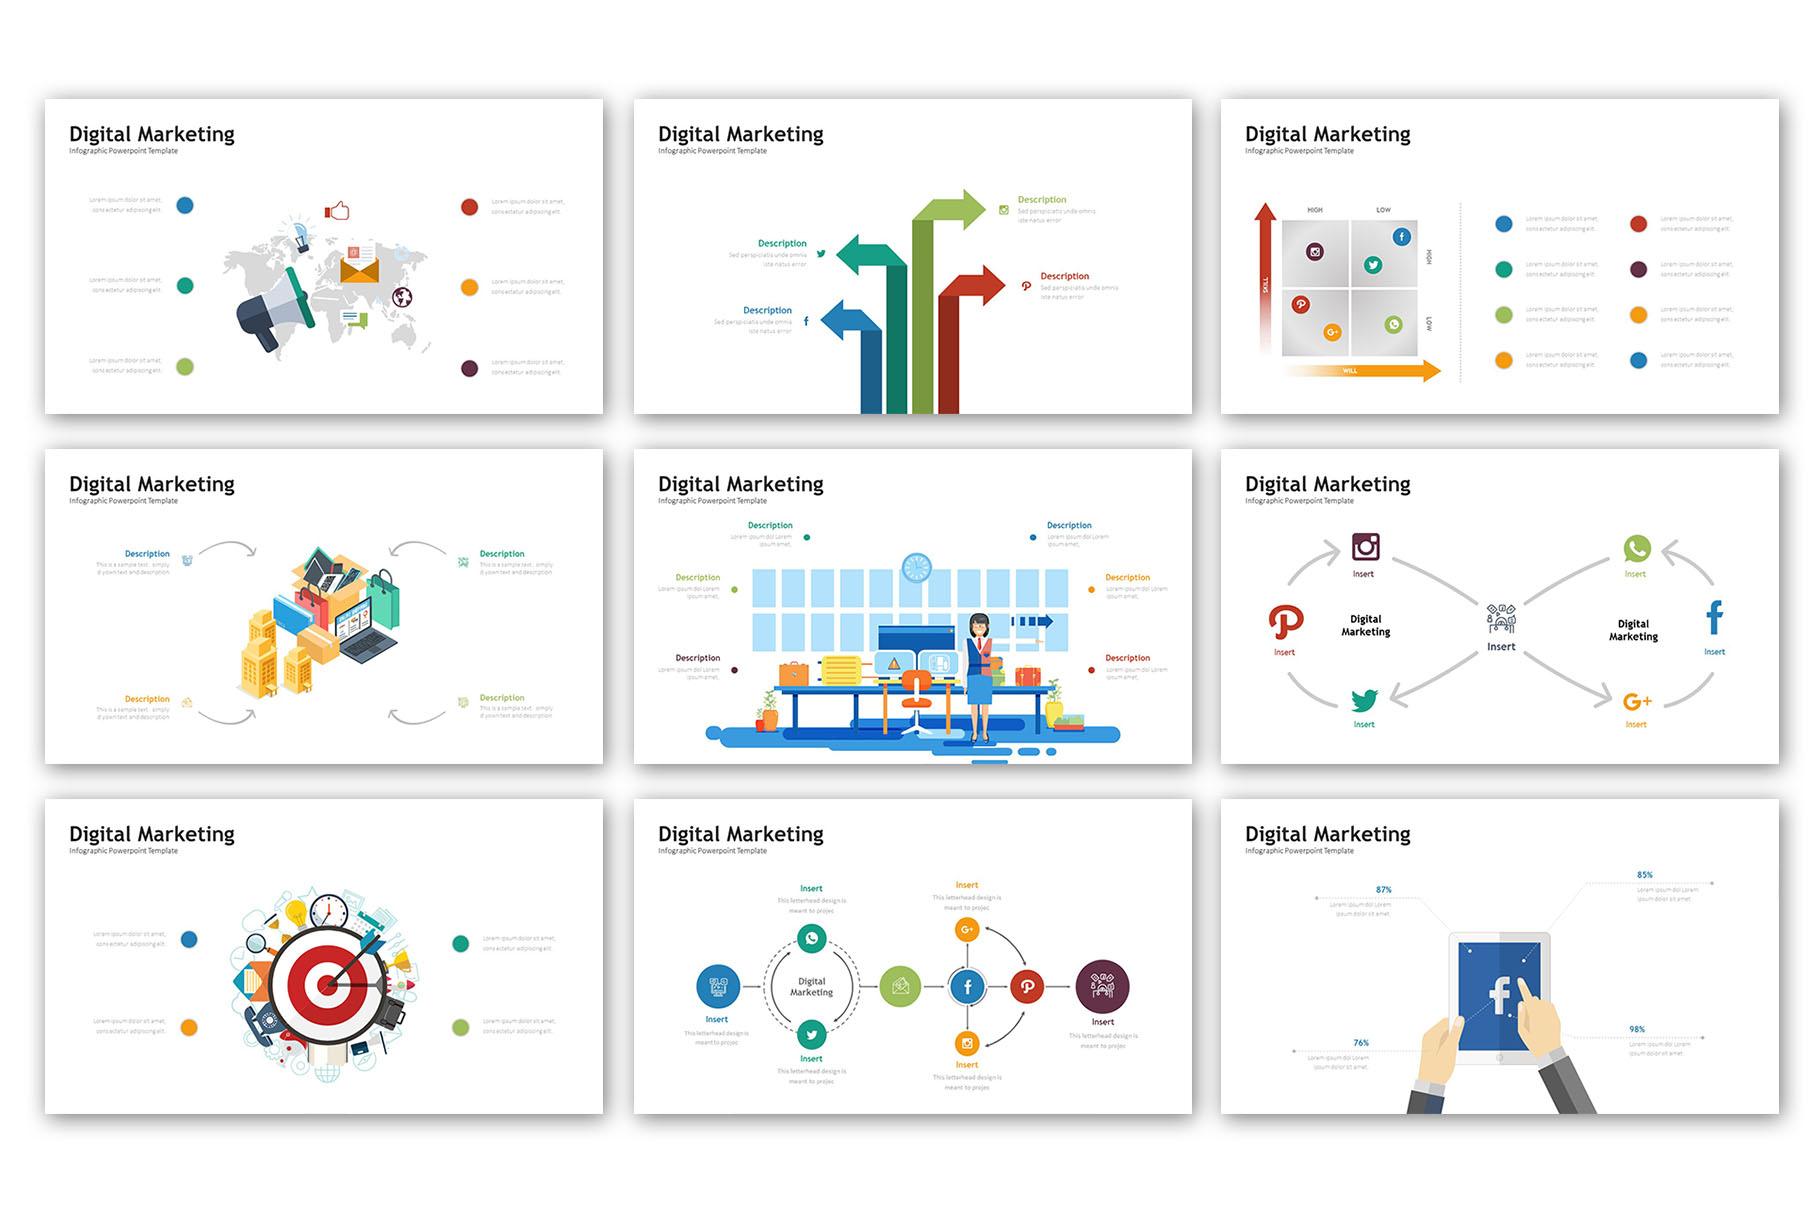 Digital Marketing Presentation - Infographic Template example image 5